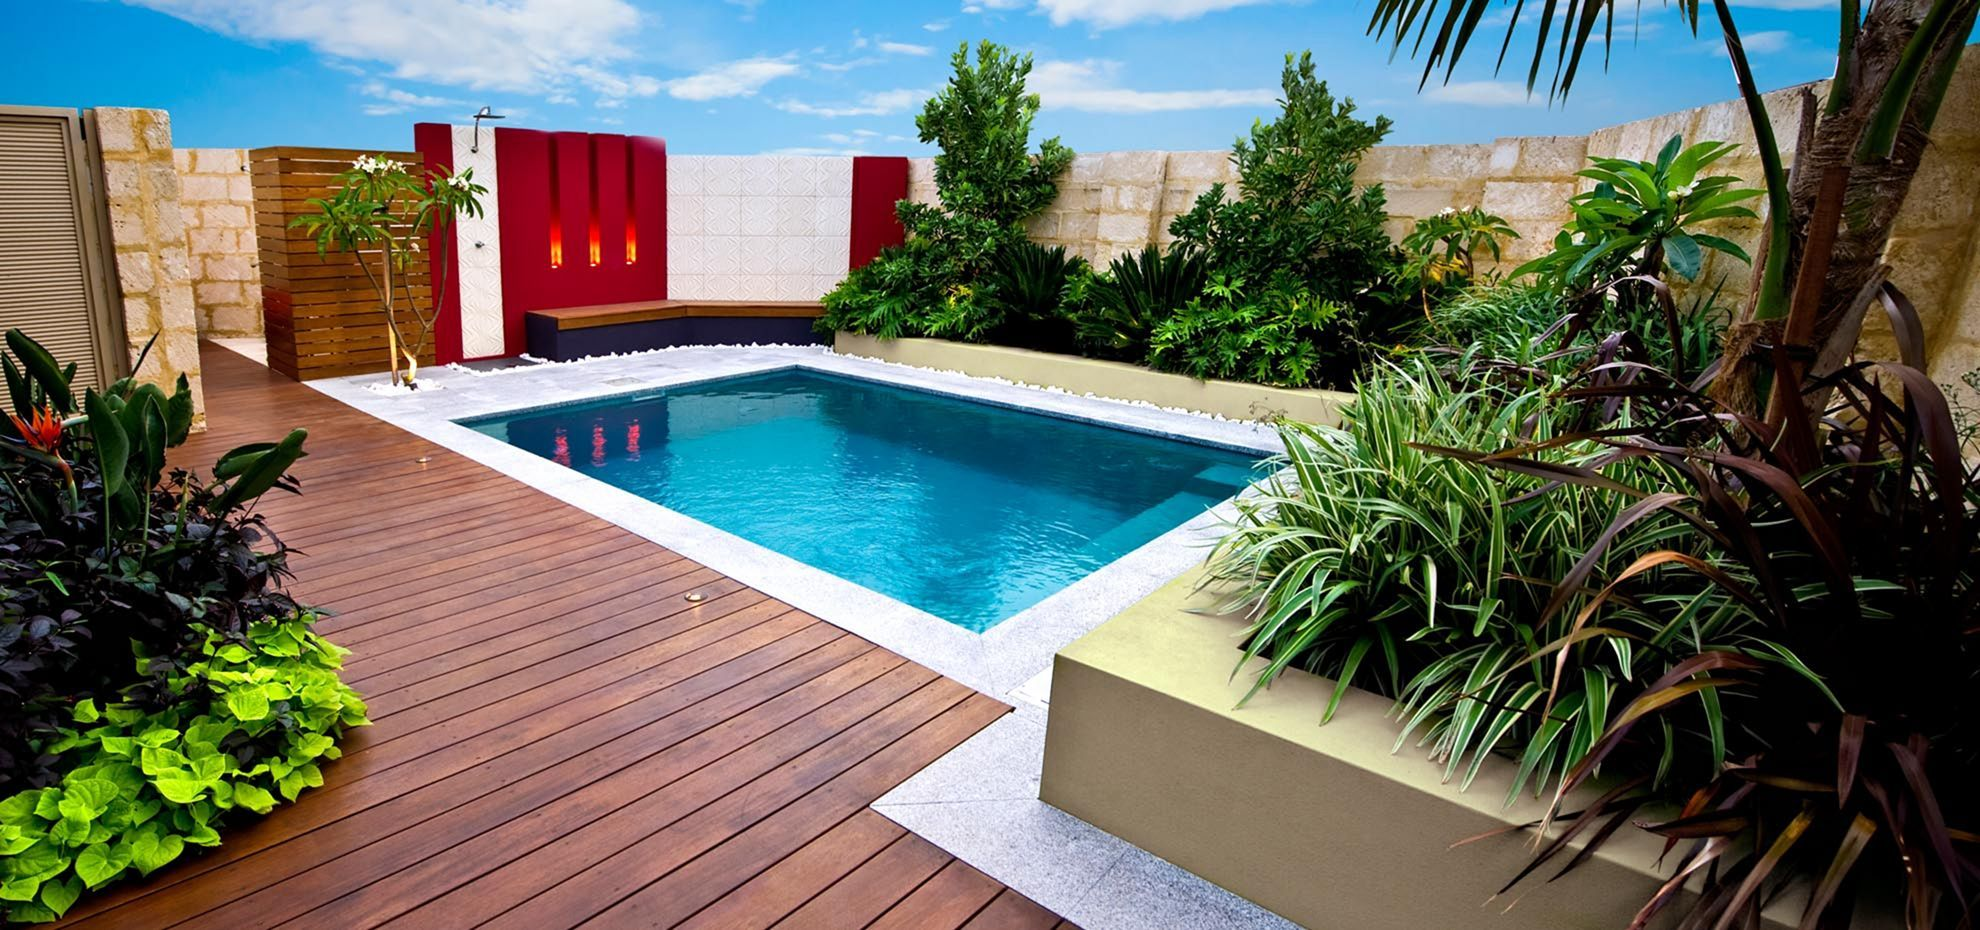 Nice 35 Gorgeous Small Swimming Pool Design For Amazing Backyard Https Usdecorating Com 3607 35 Gorgeou Backyard Pool Small Pool Design Swimming Pool Designs